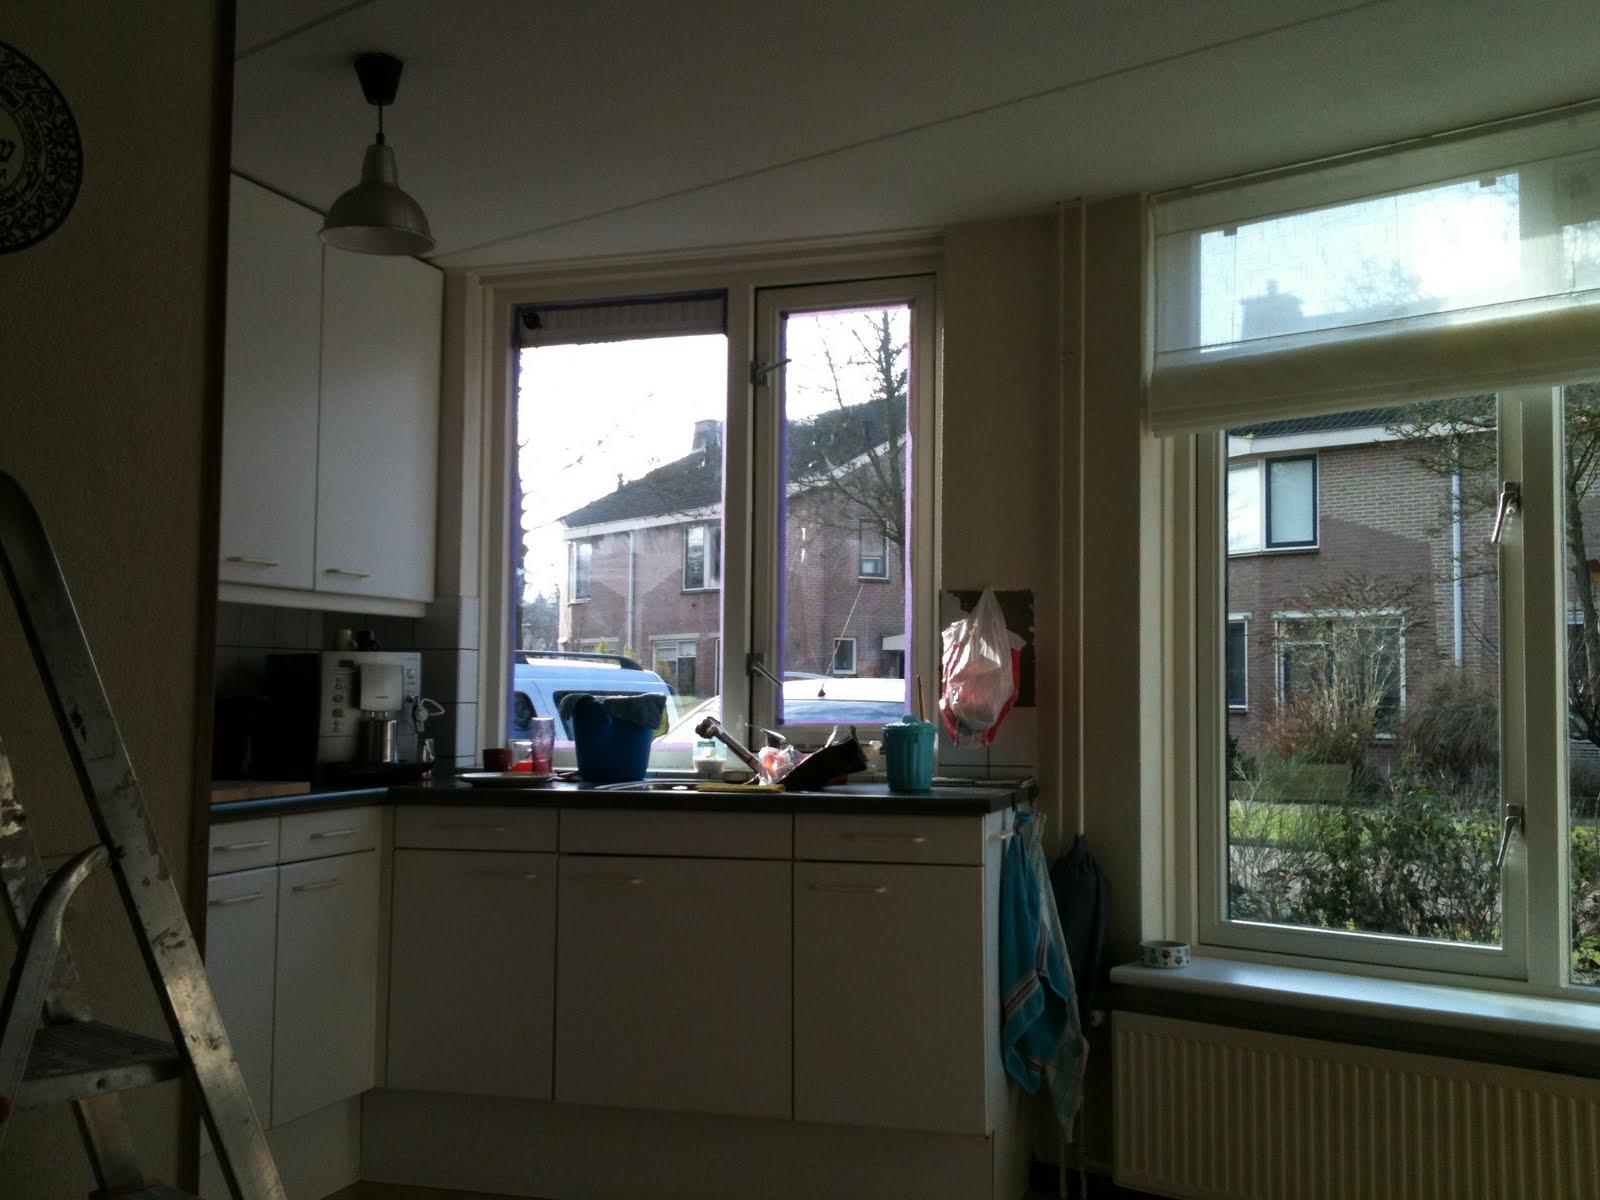 Caroline keuken update - Gordijnen meid ...